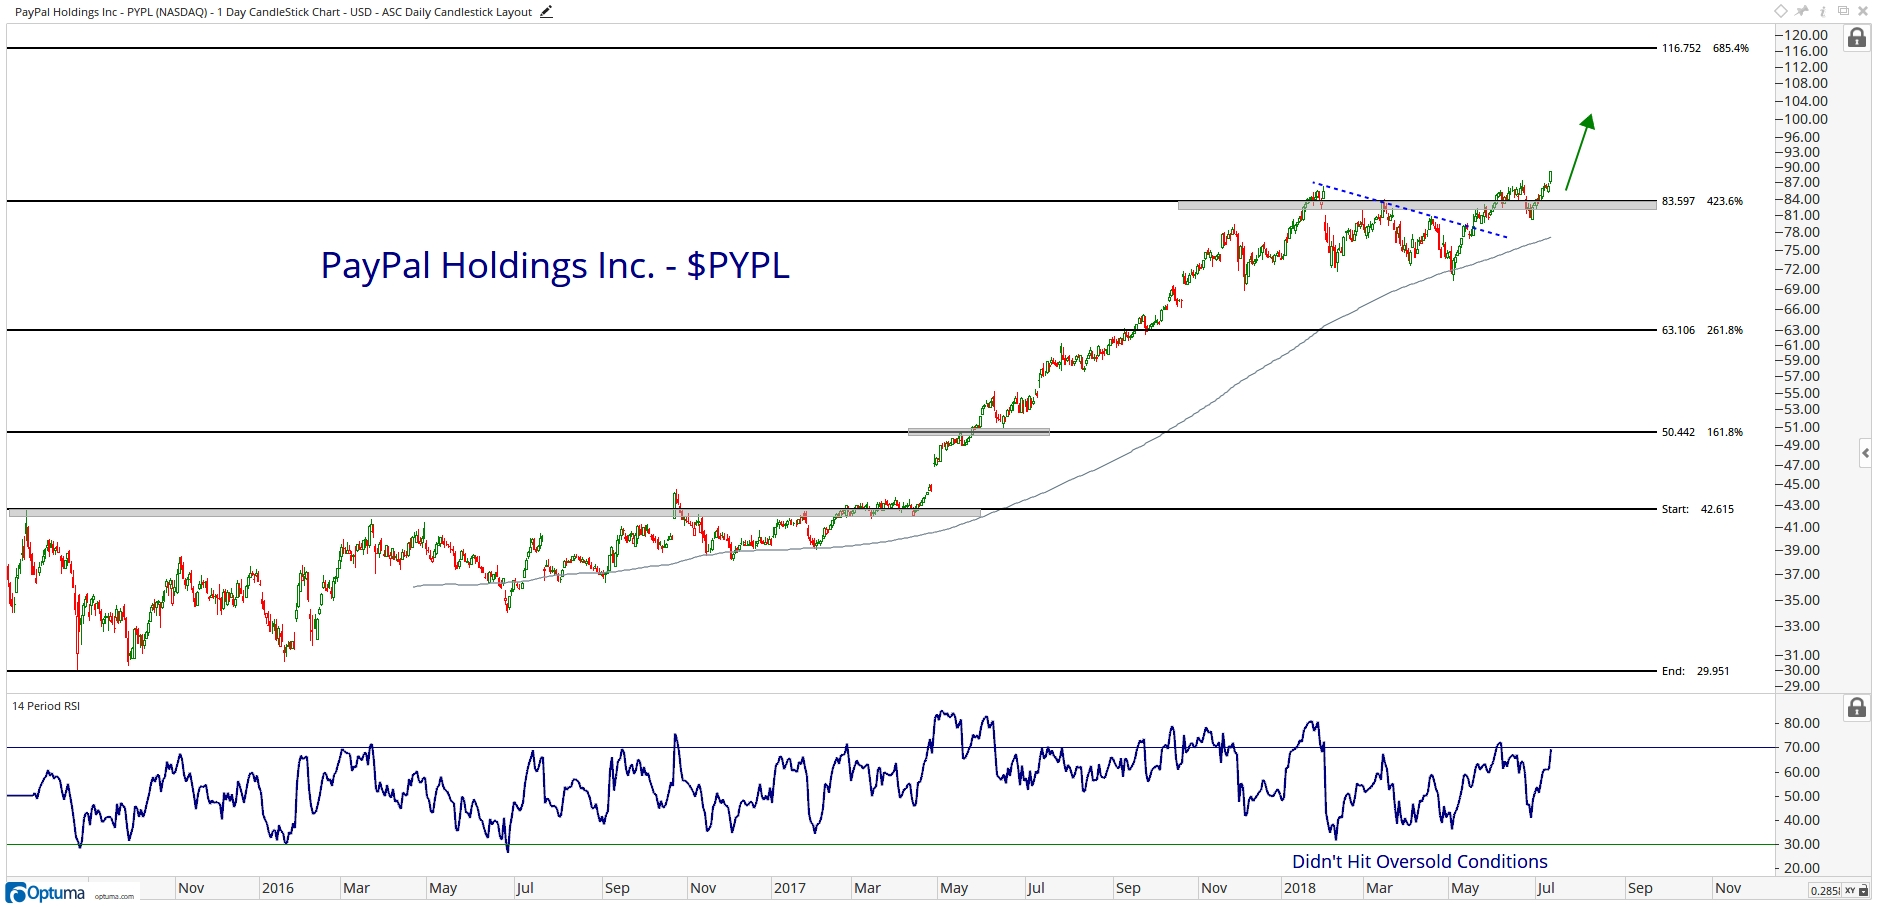 Nasdaq 100 Stocks Breaking Out - All Star Charts -